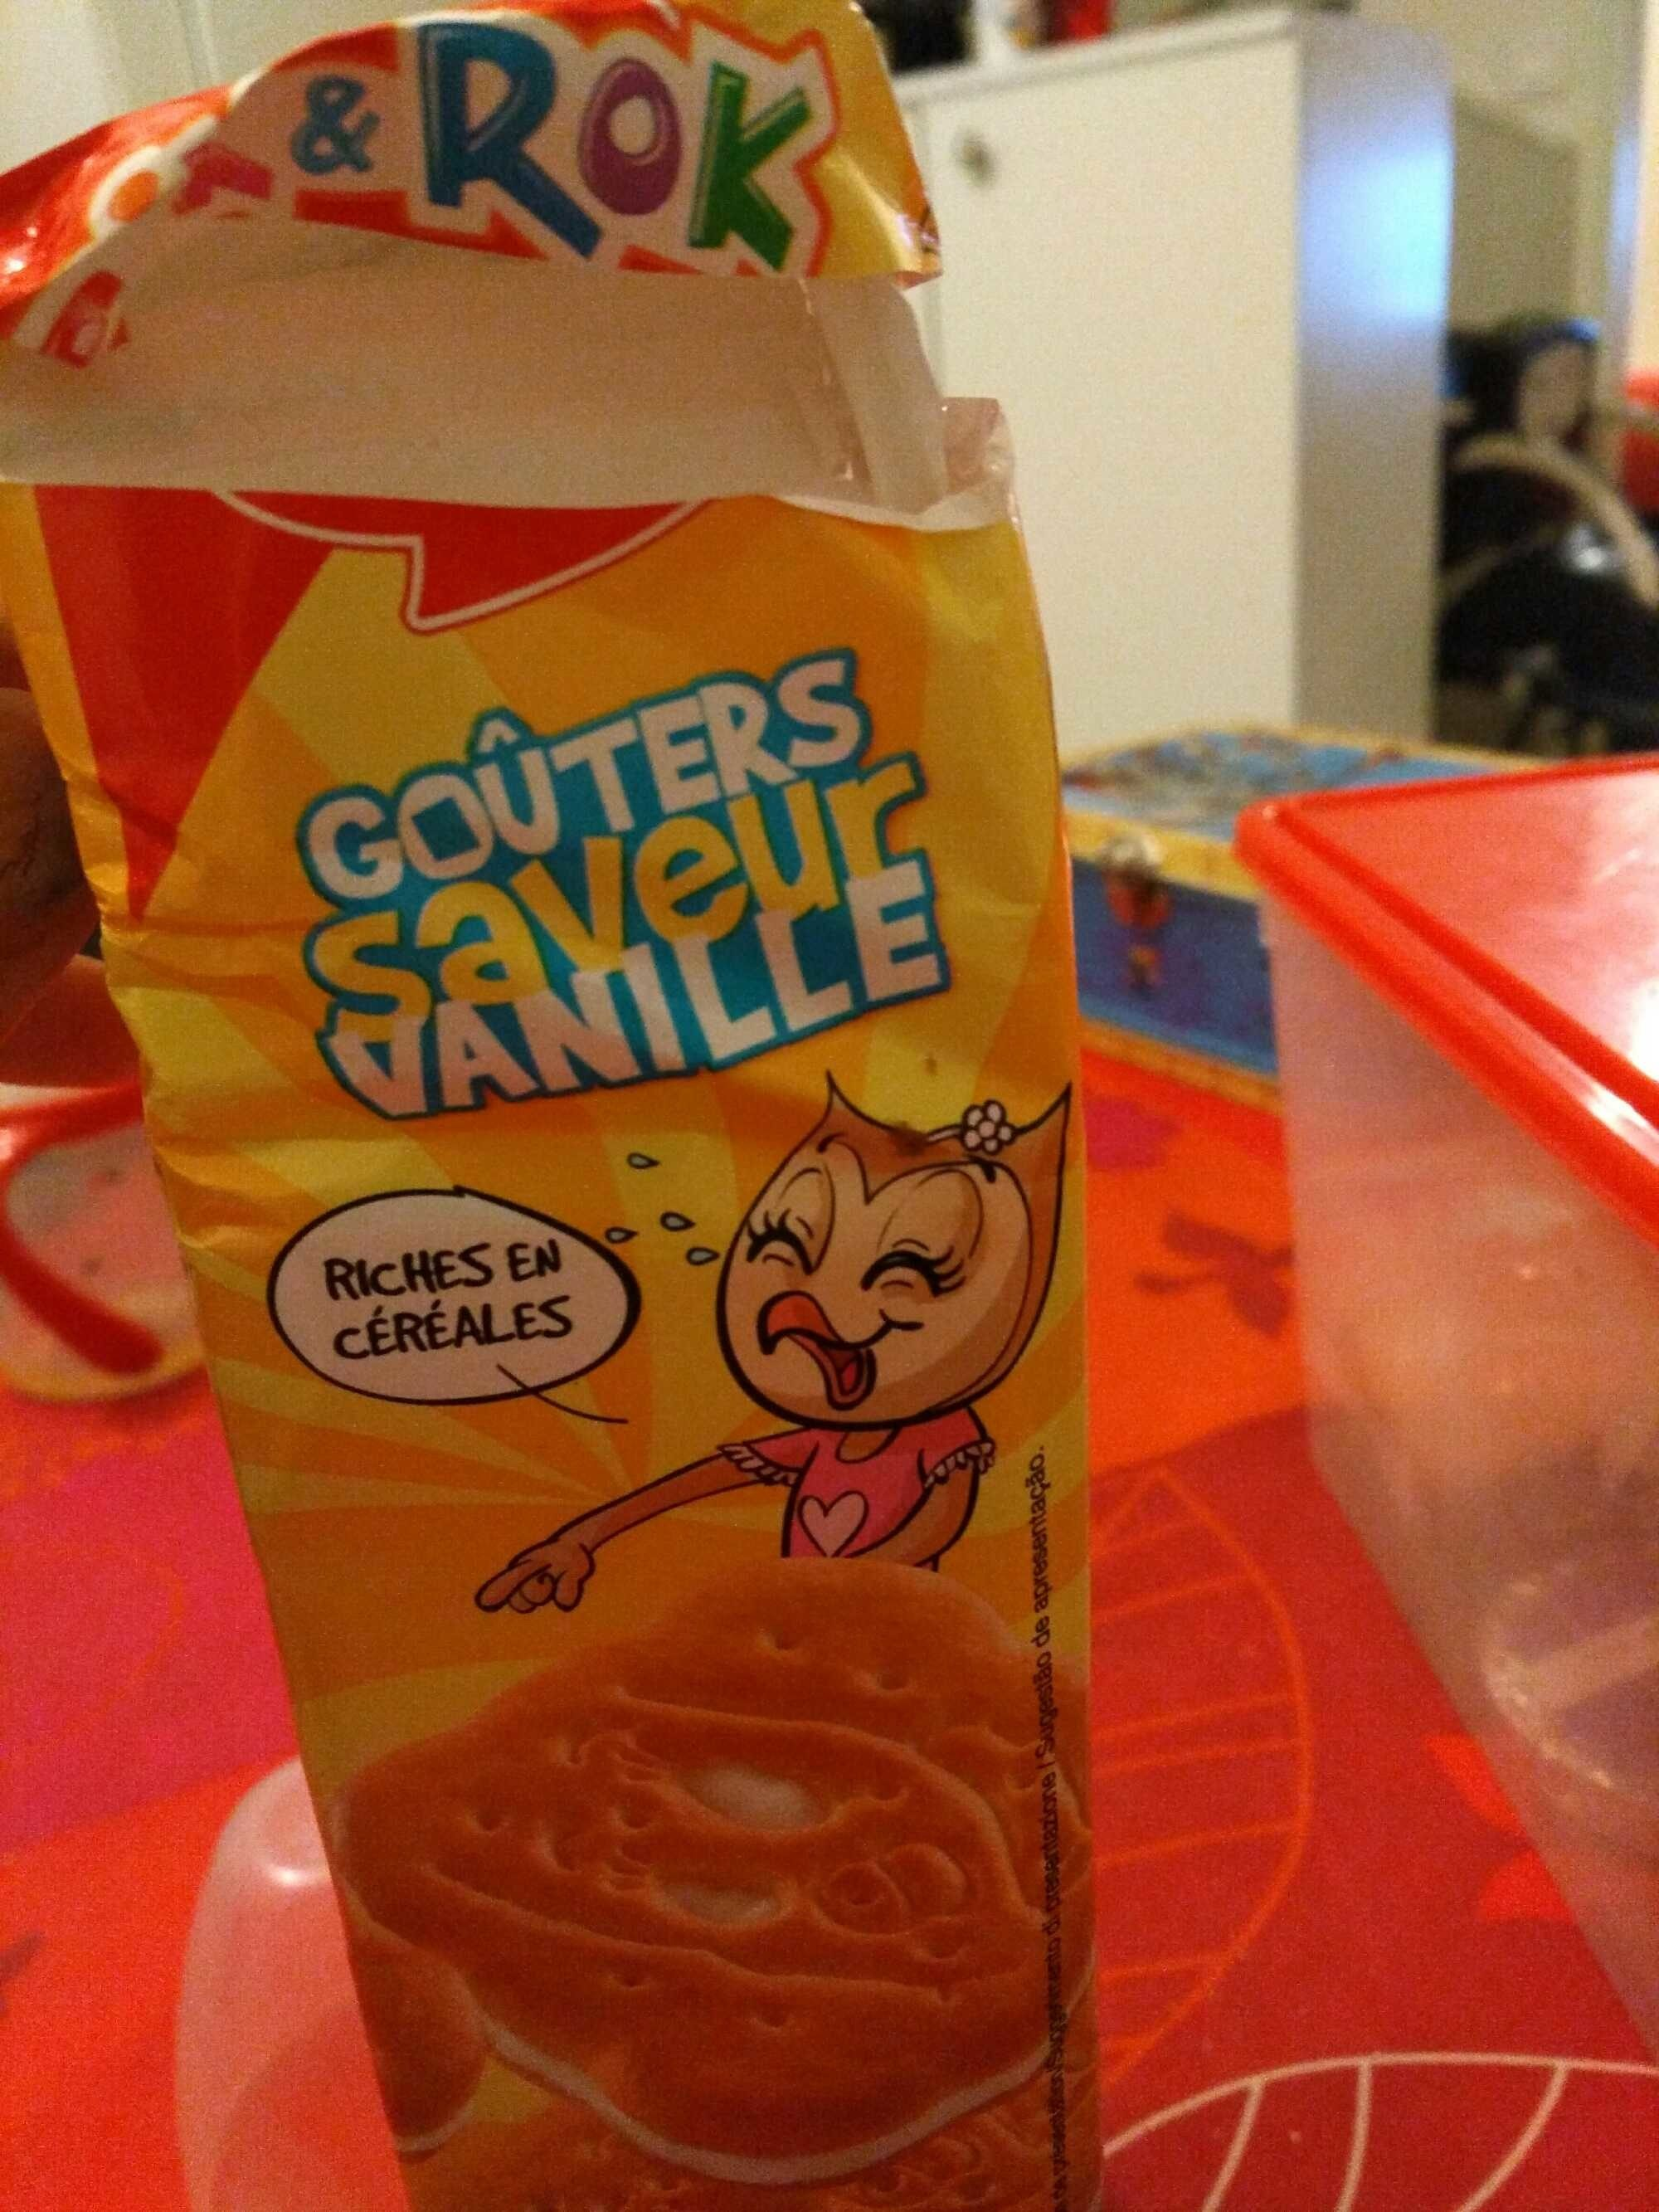 Goûters saveur vanille - Product